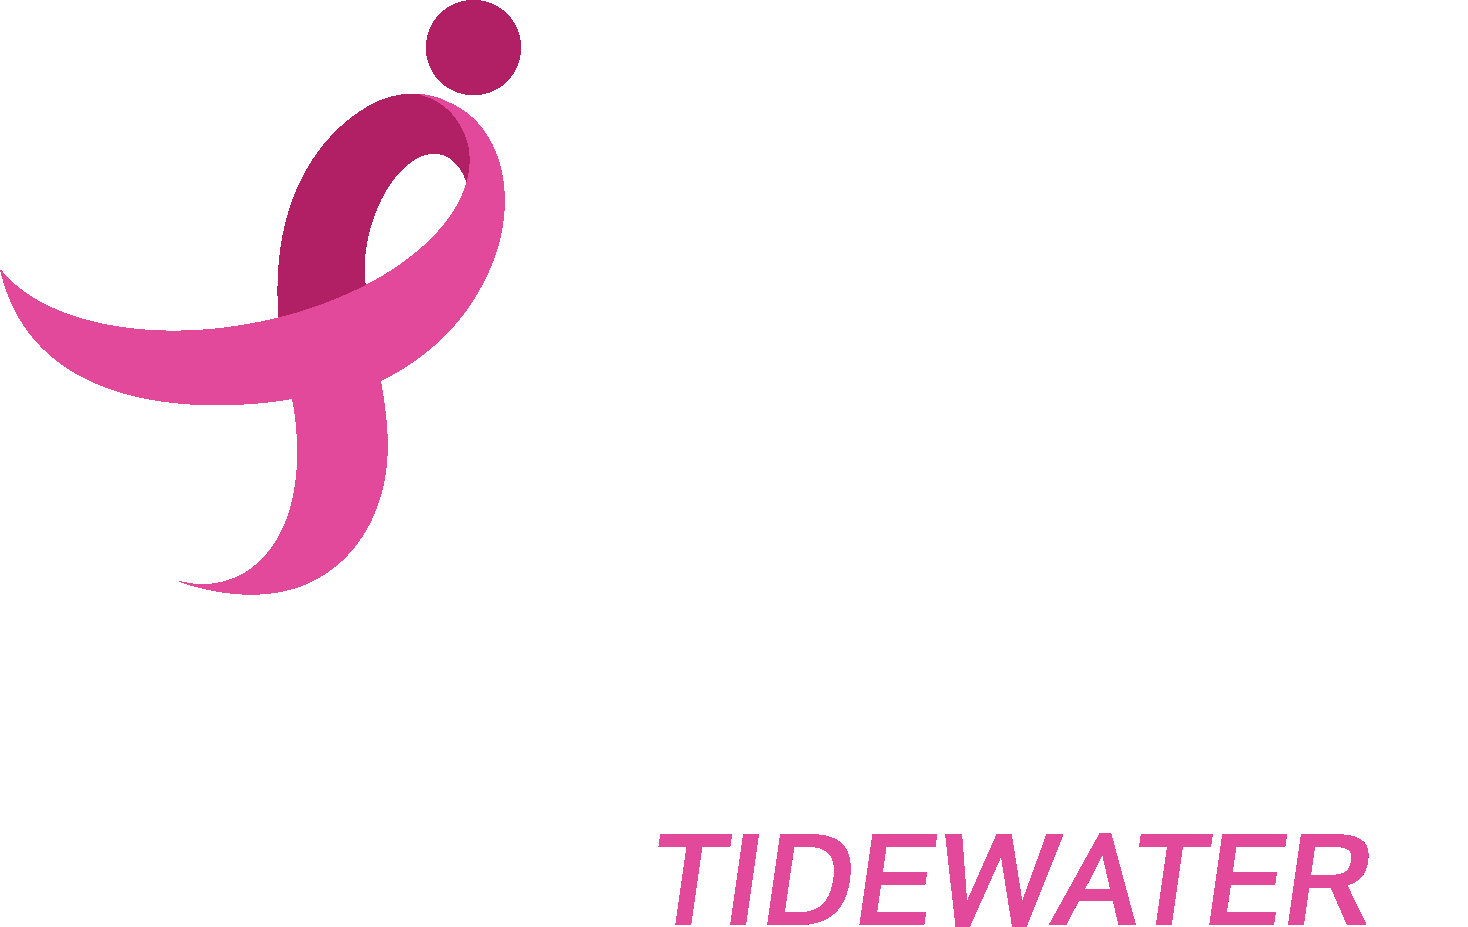 Susan G Komen Tidewater 2018 Komen Tidewater Race For